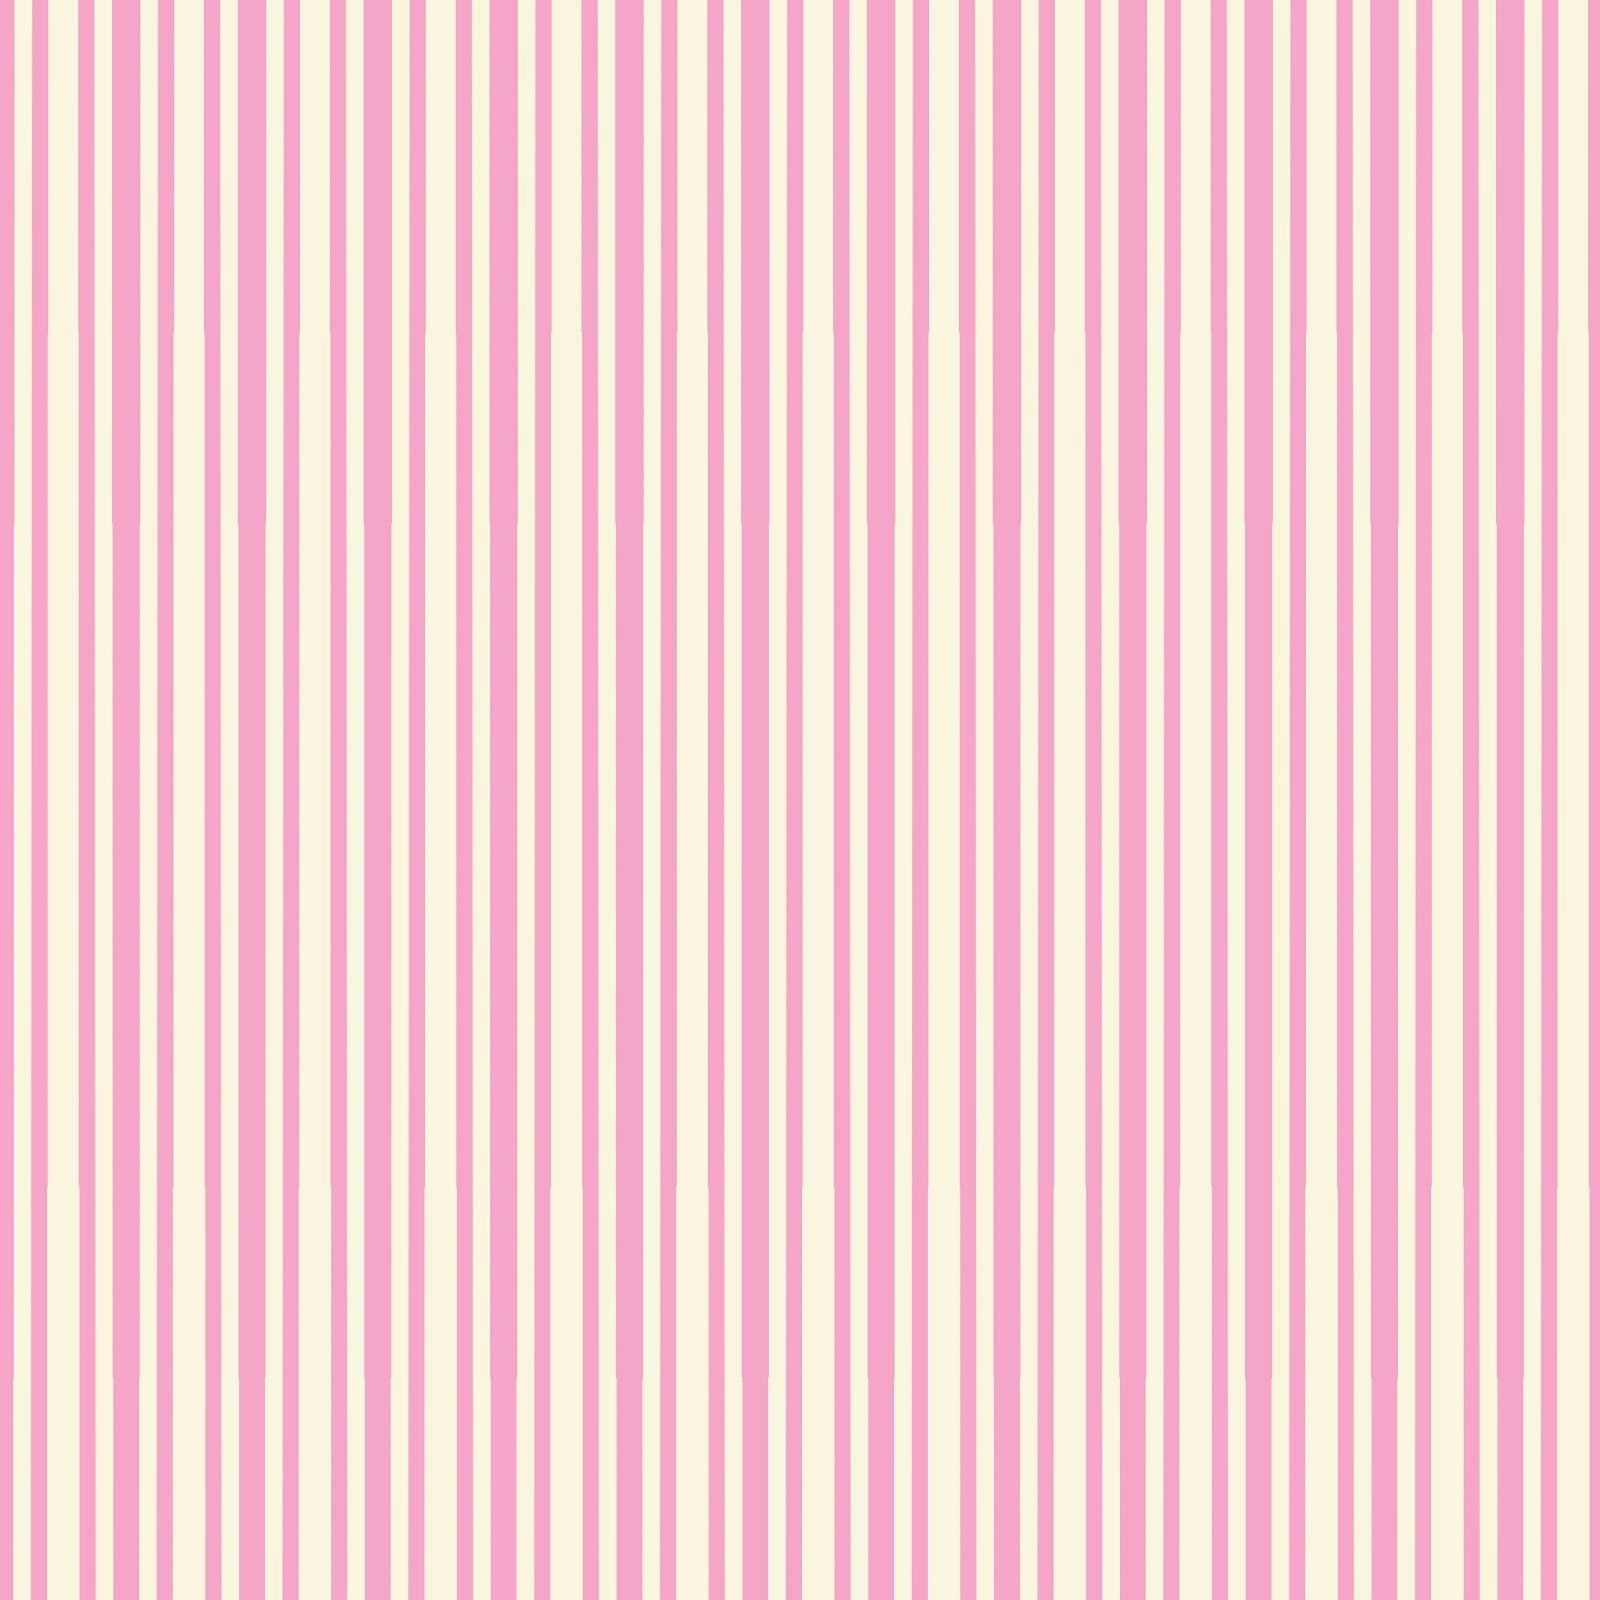 http://1.bp.blogspot.com/-8oB7y9dOkGI/UDBw4ZpOLiI/AAAAAAAAGNI/pdwgjDt6GbI/s1600/free%2Bdigital%2Bscrapbook%2Bpaper_pink%2Bcream%2Bticking%2Bstripes.jpg